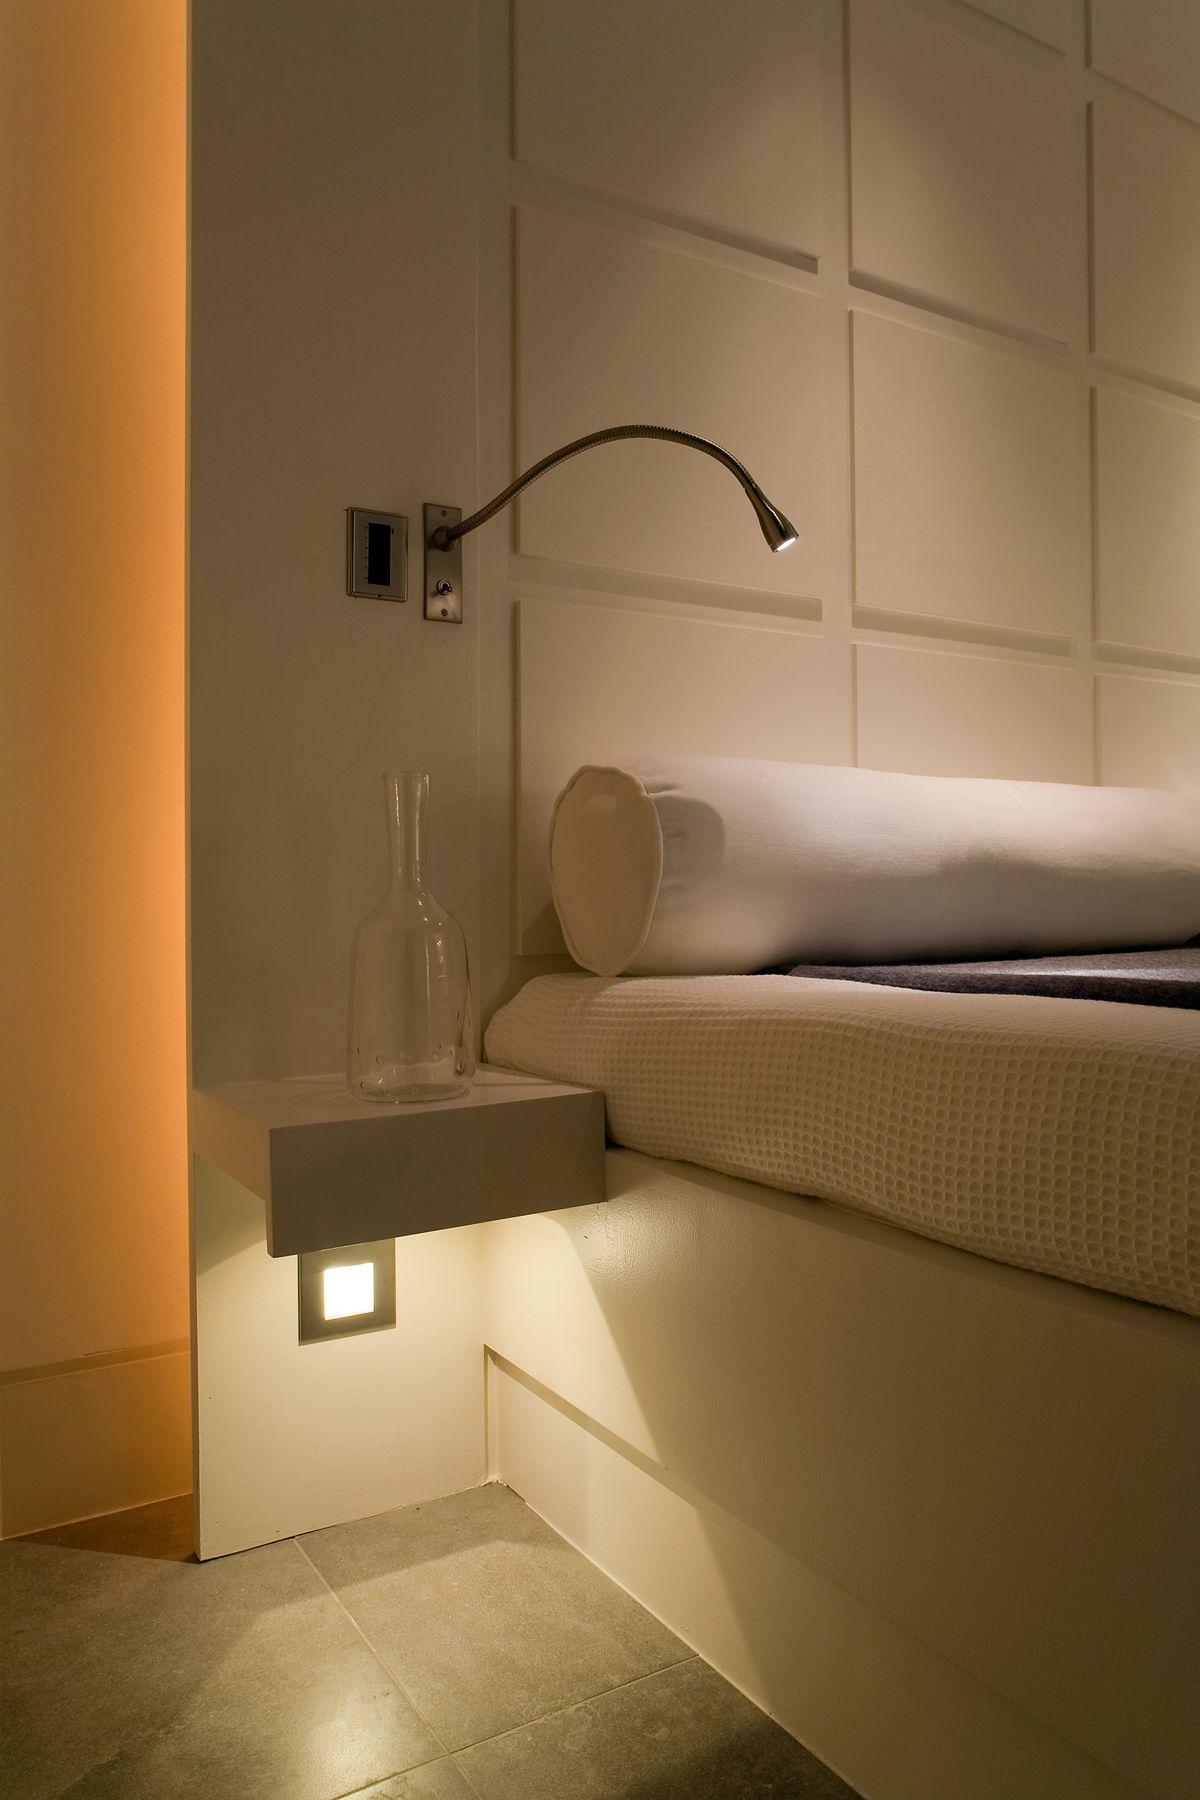 Wall lamp Bedroom Reading lamp Light